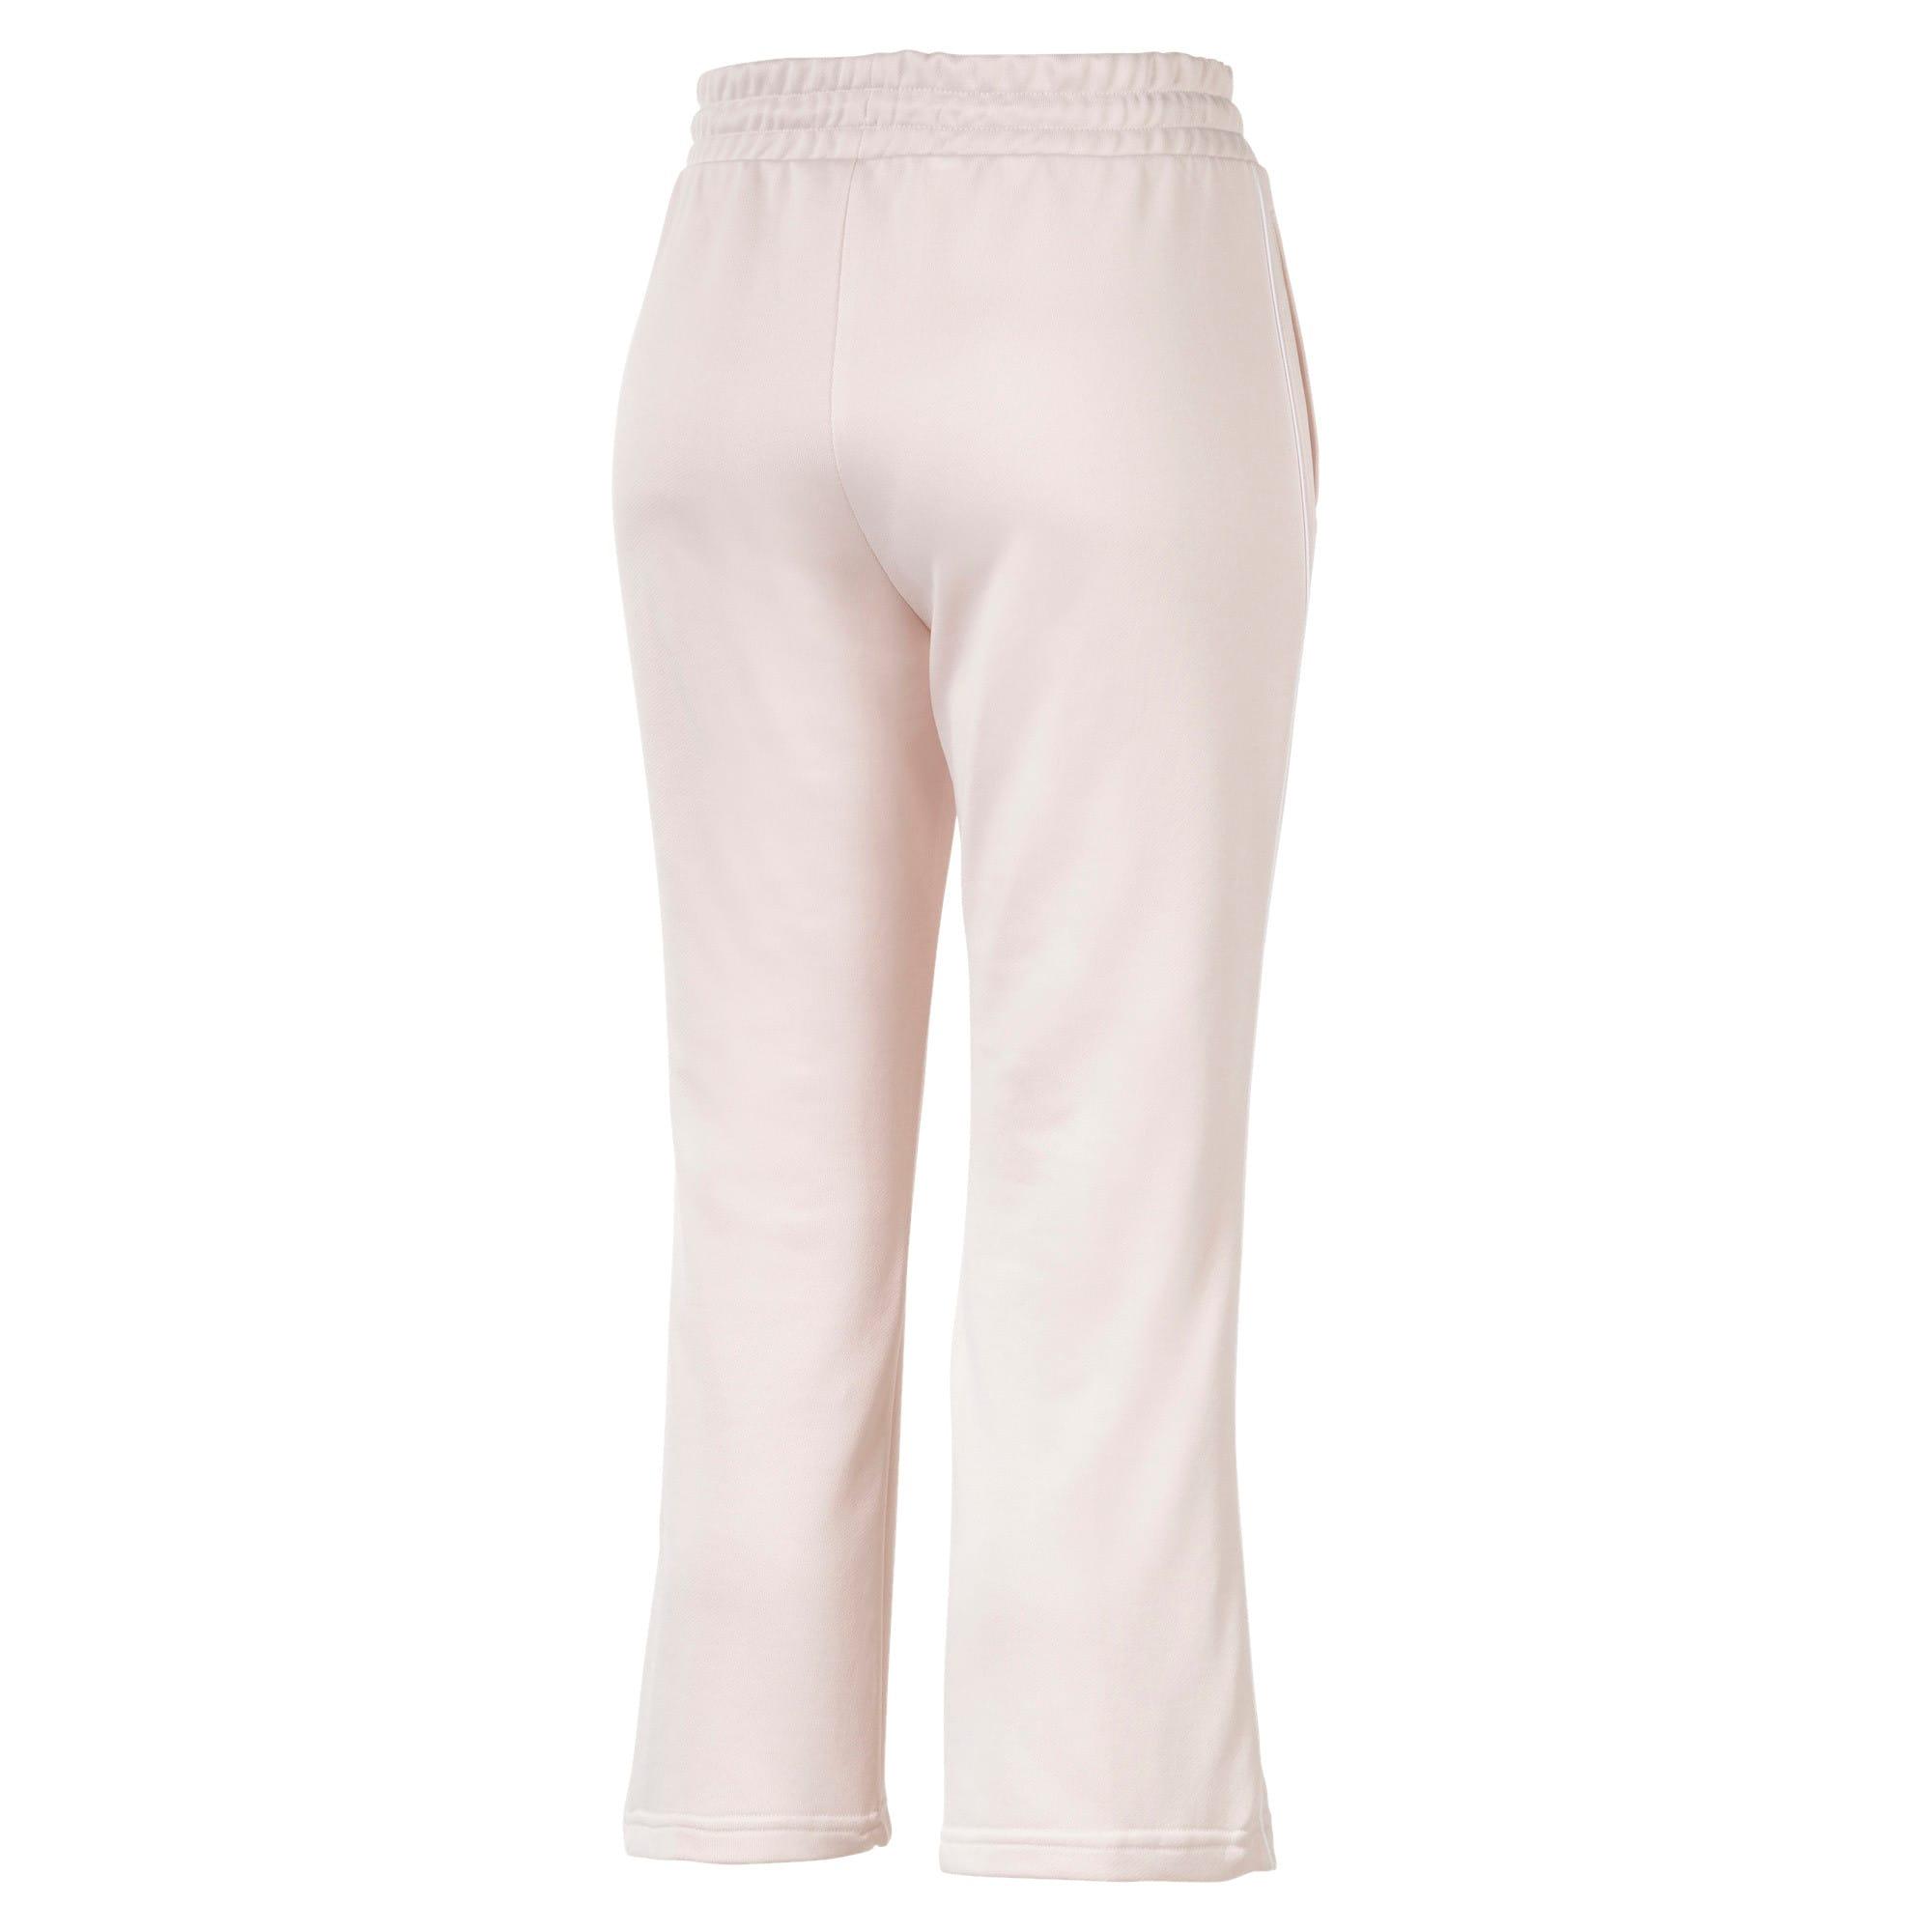 Thumbnail 5 of Classics Women's Kick Flare Pants, Pastel Parchment, medium